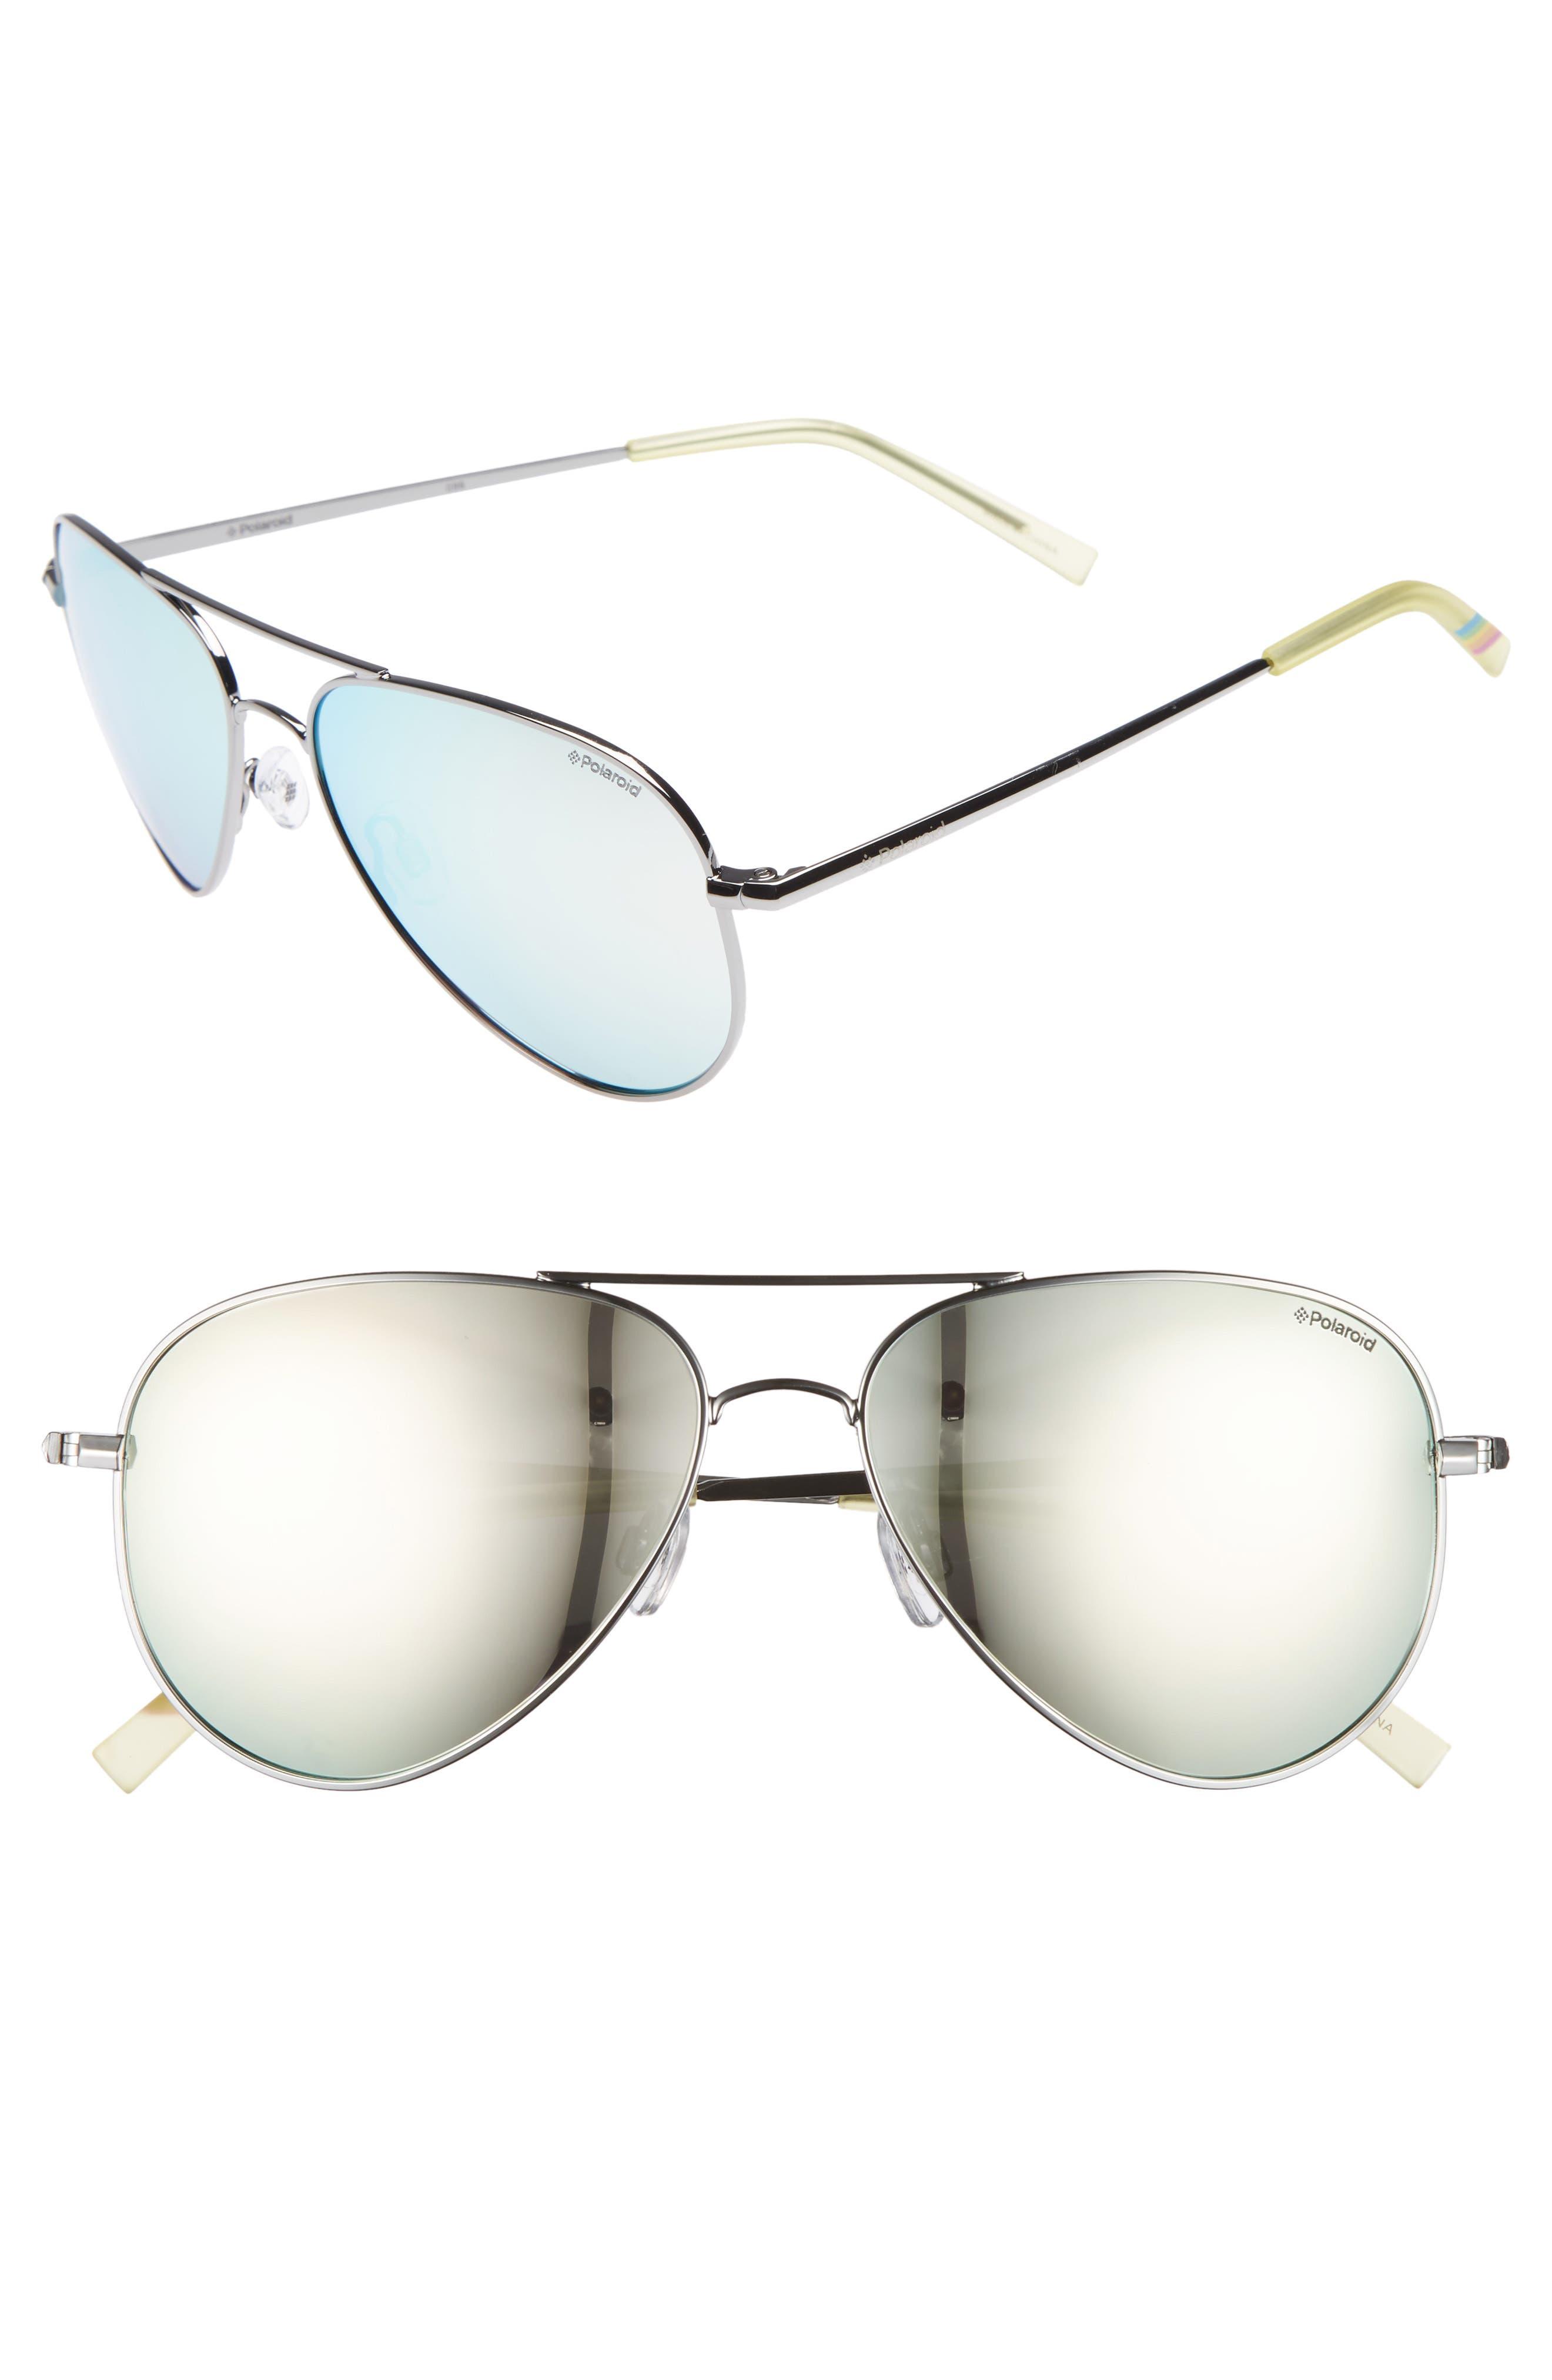 3736da157bb Polaroid 56Mm Polarized Aviator Sunglasses - Ruthenium  Grey  Silver